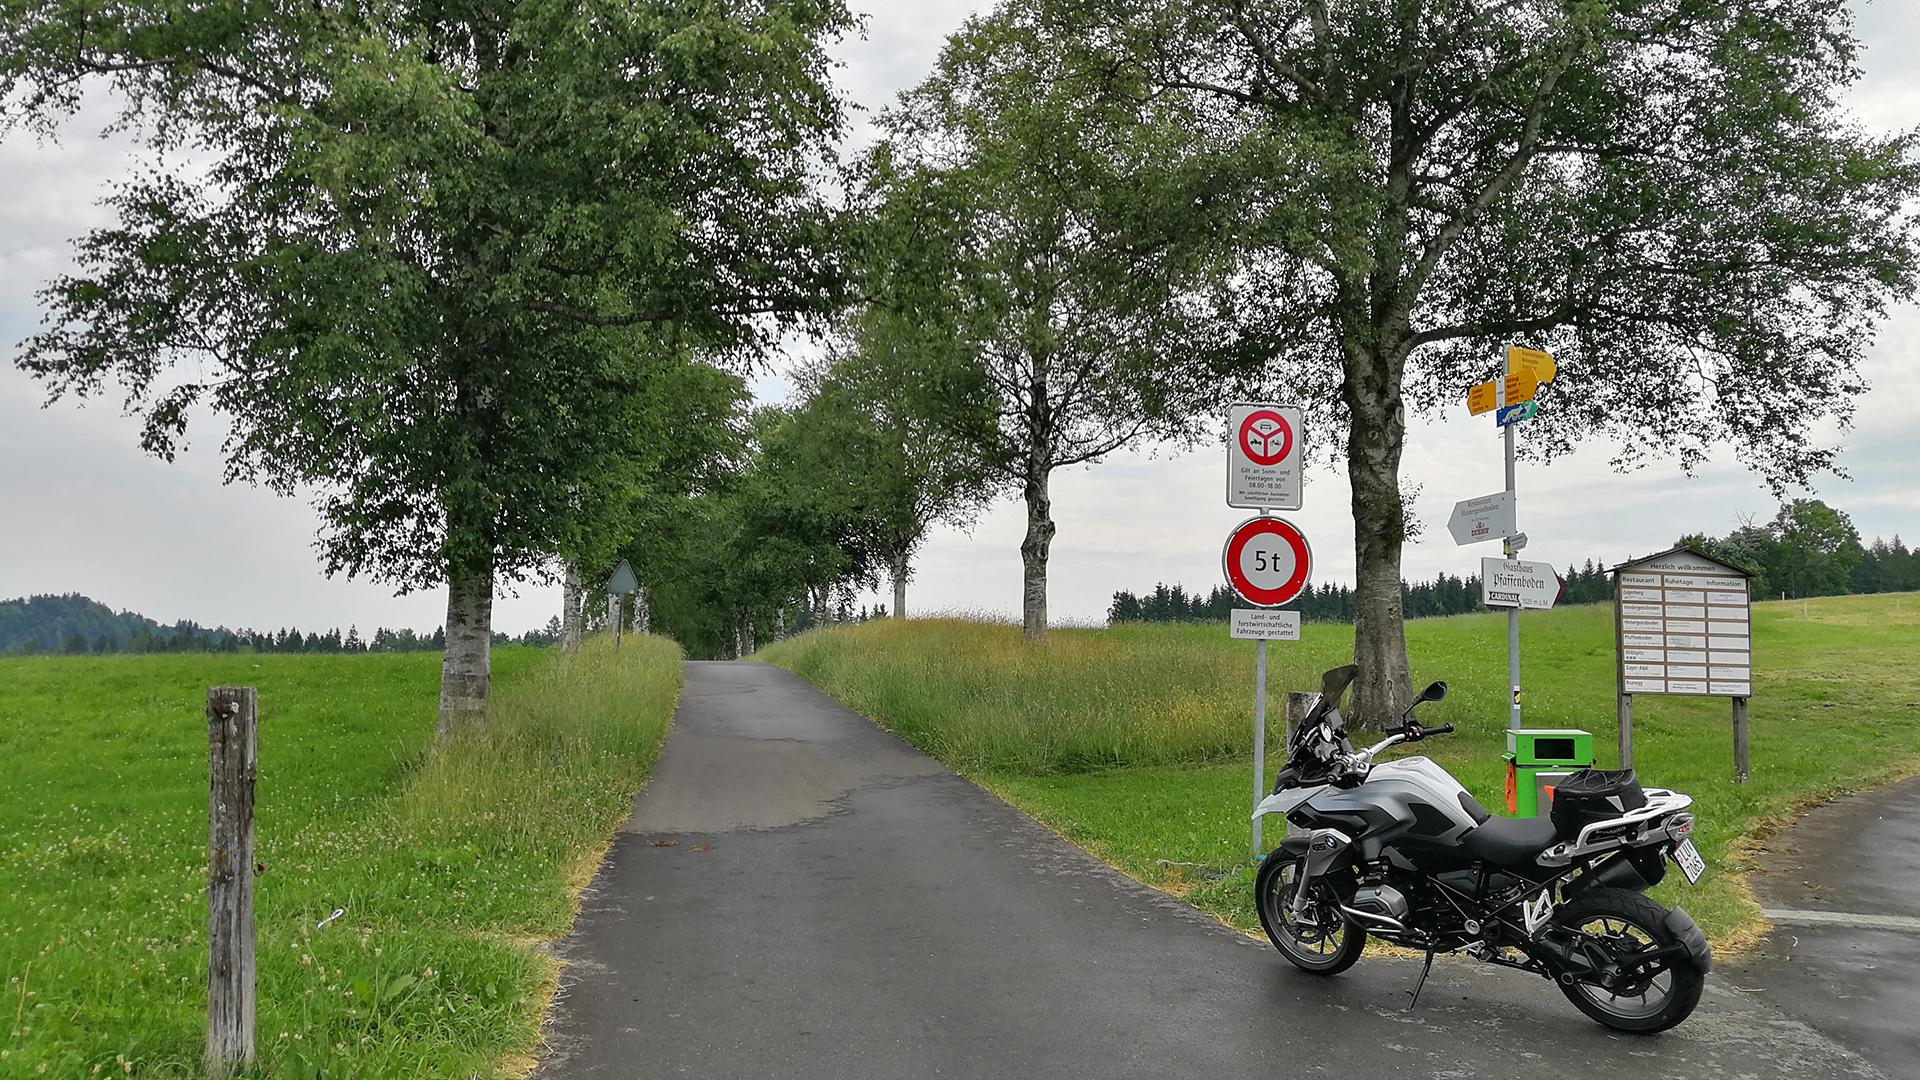 0985 - CH - Zugerberg Früebüel